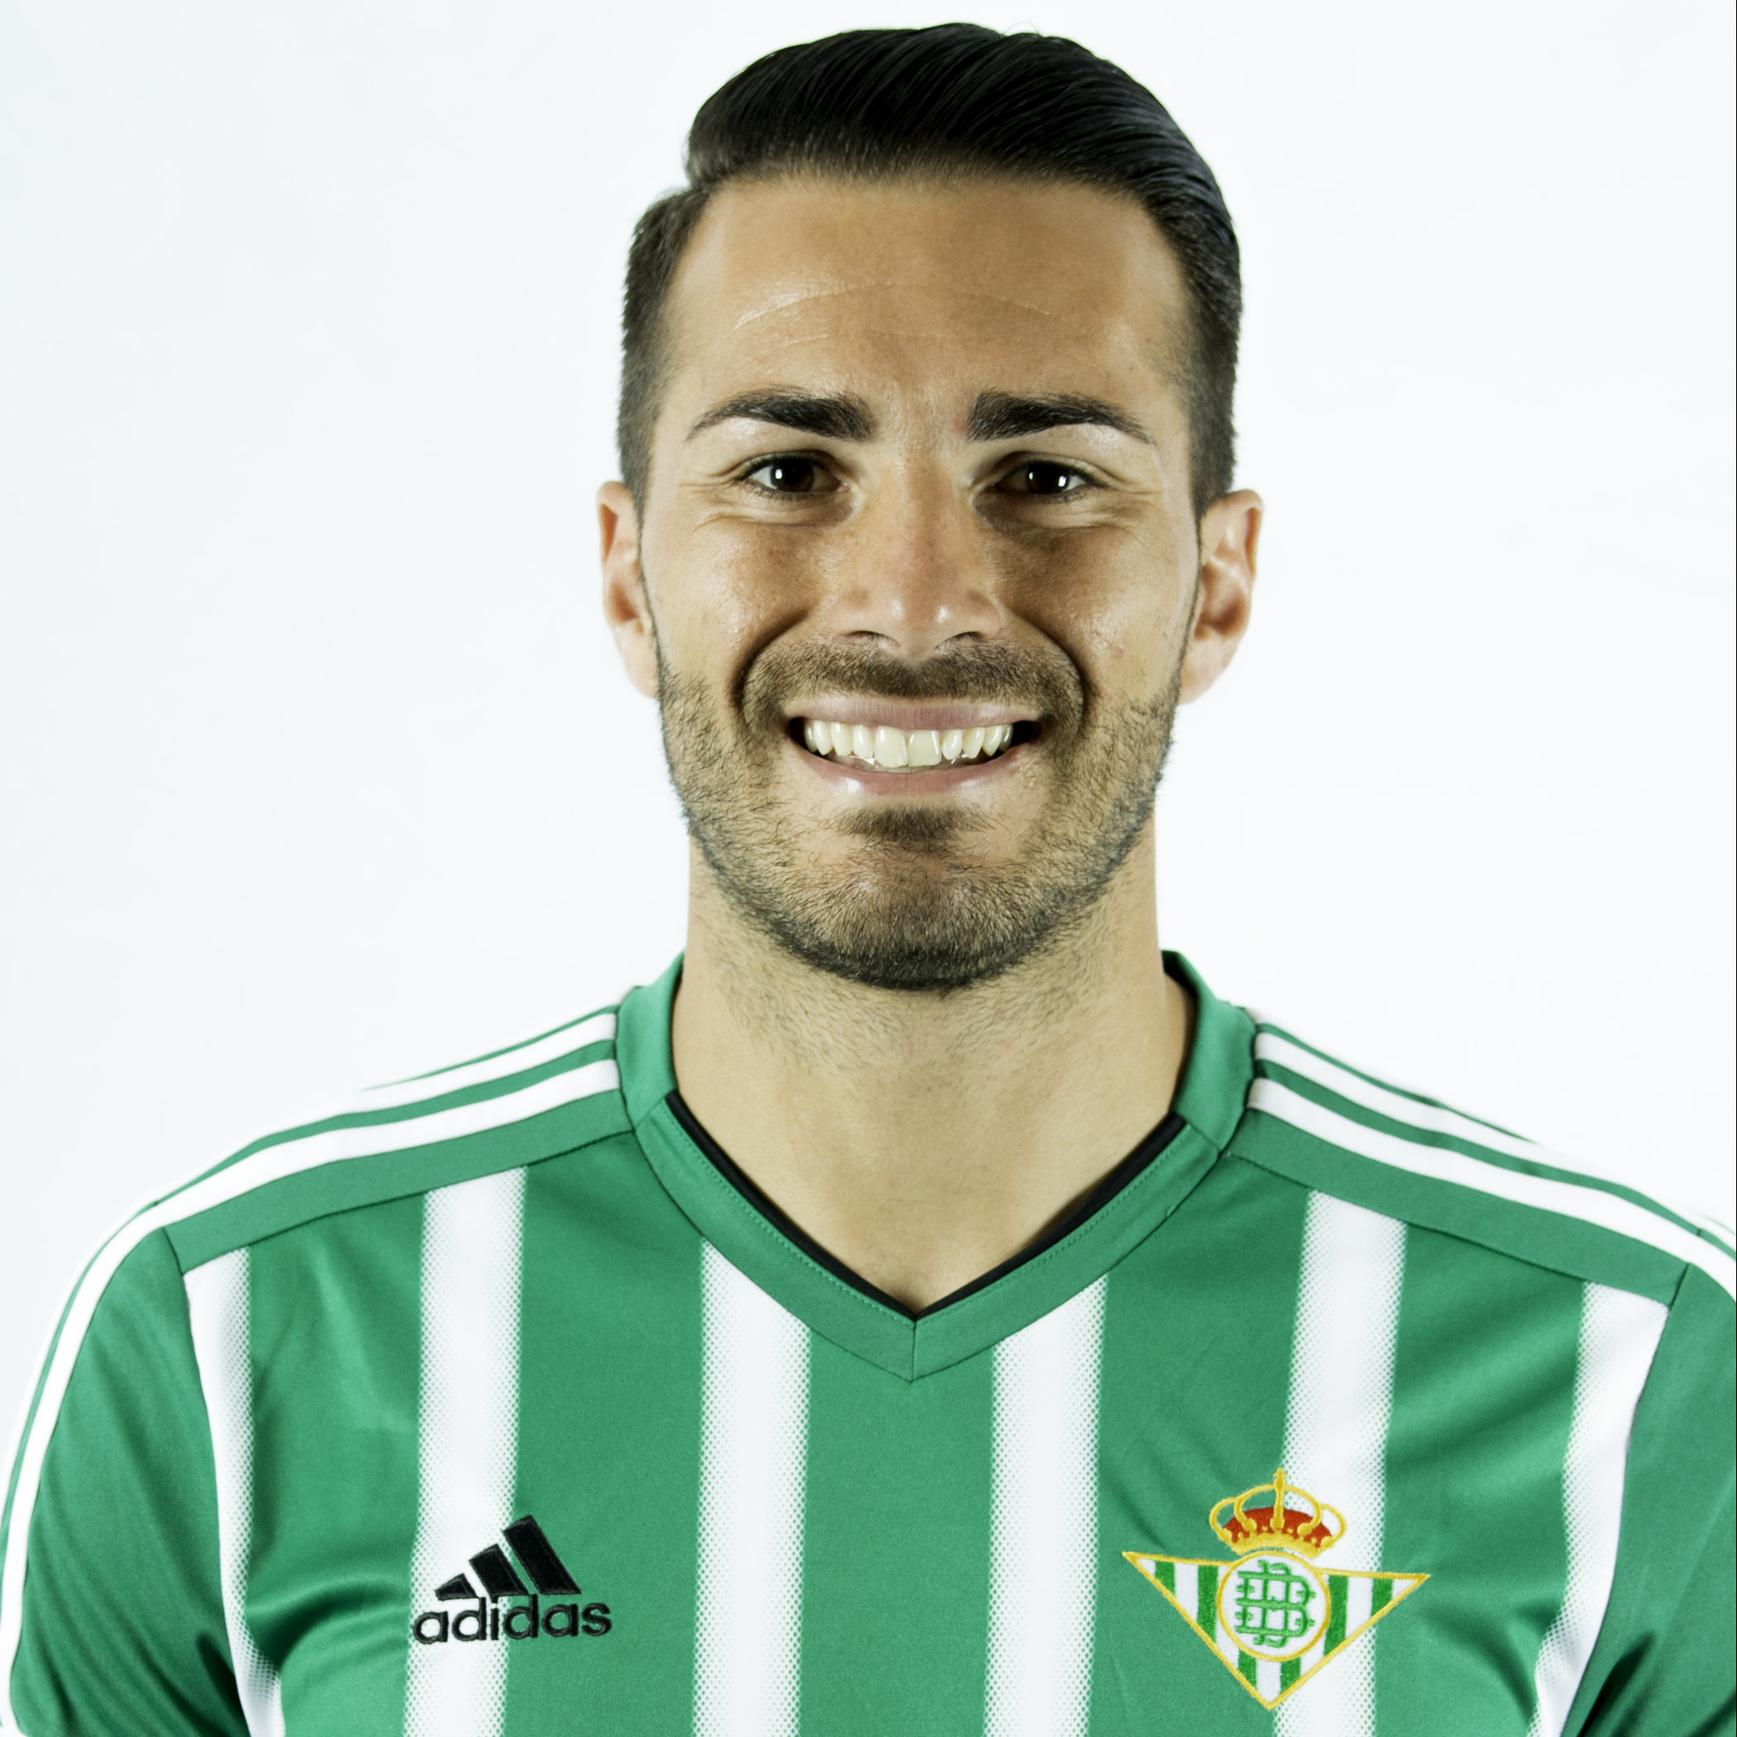 El futbolista de Xàbia